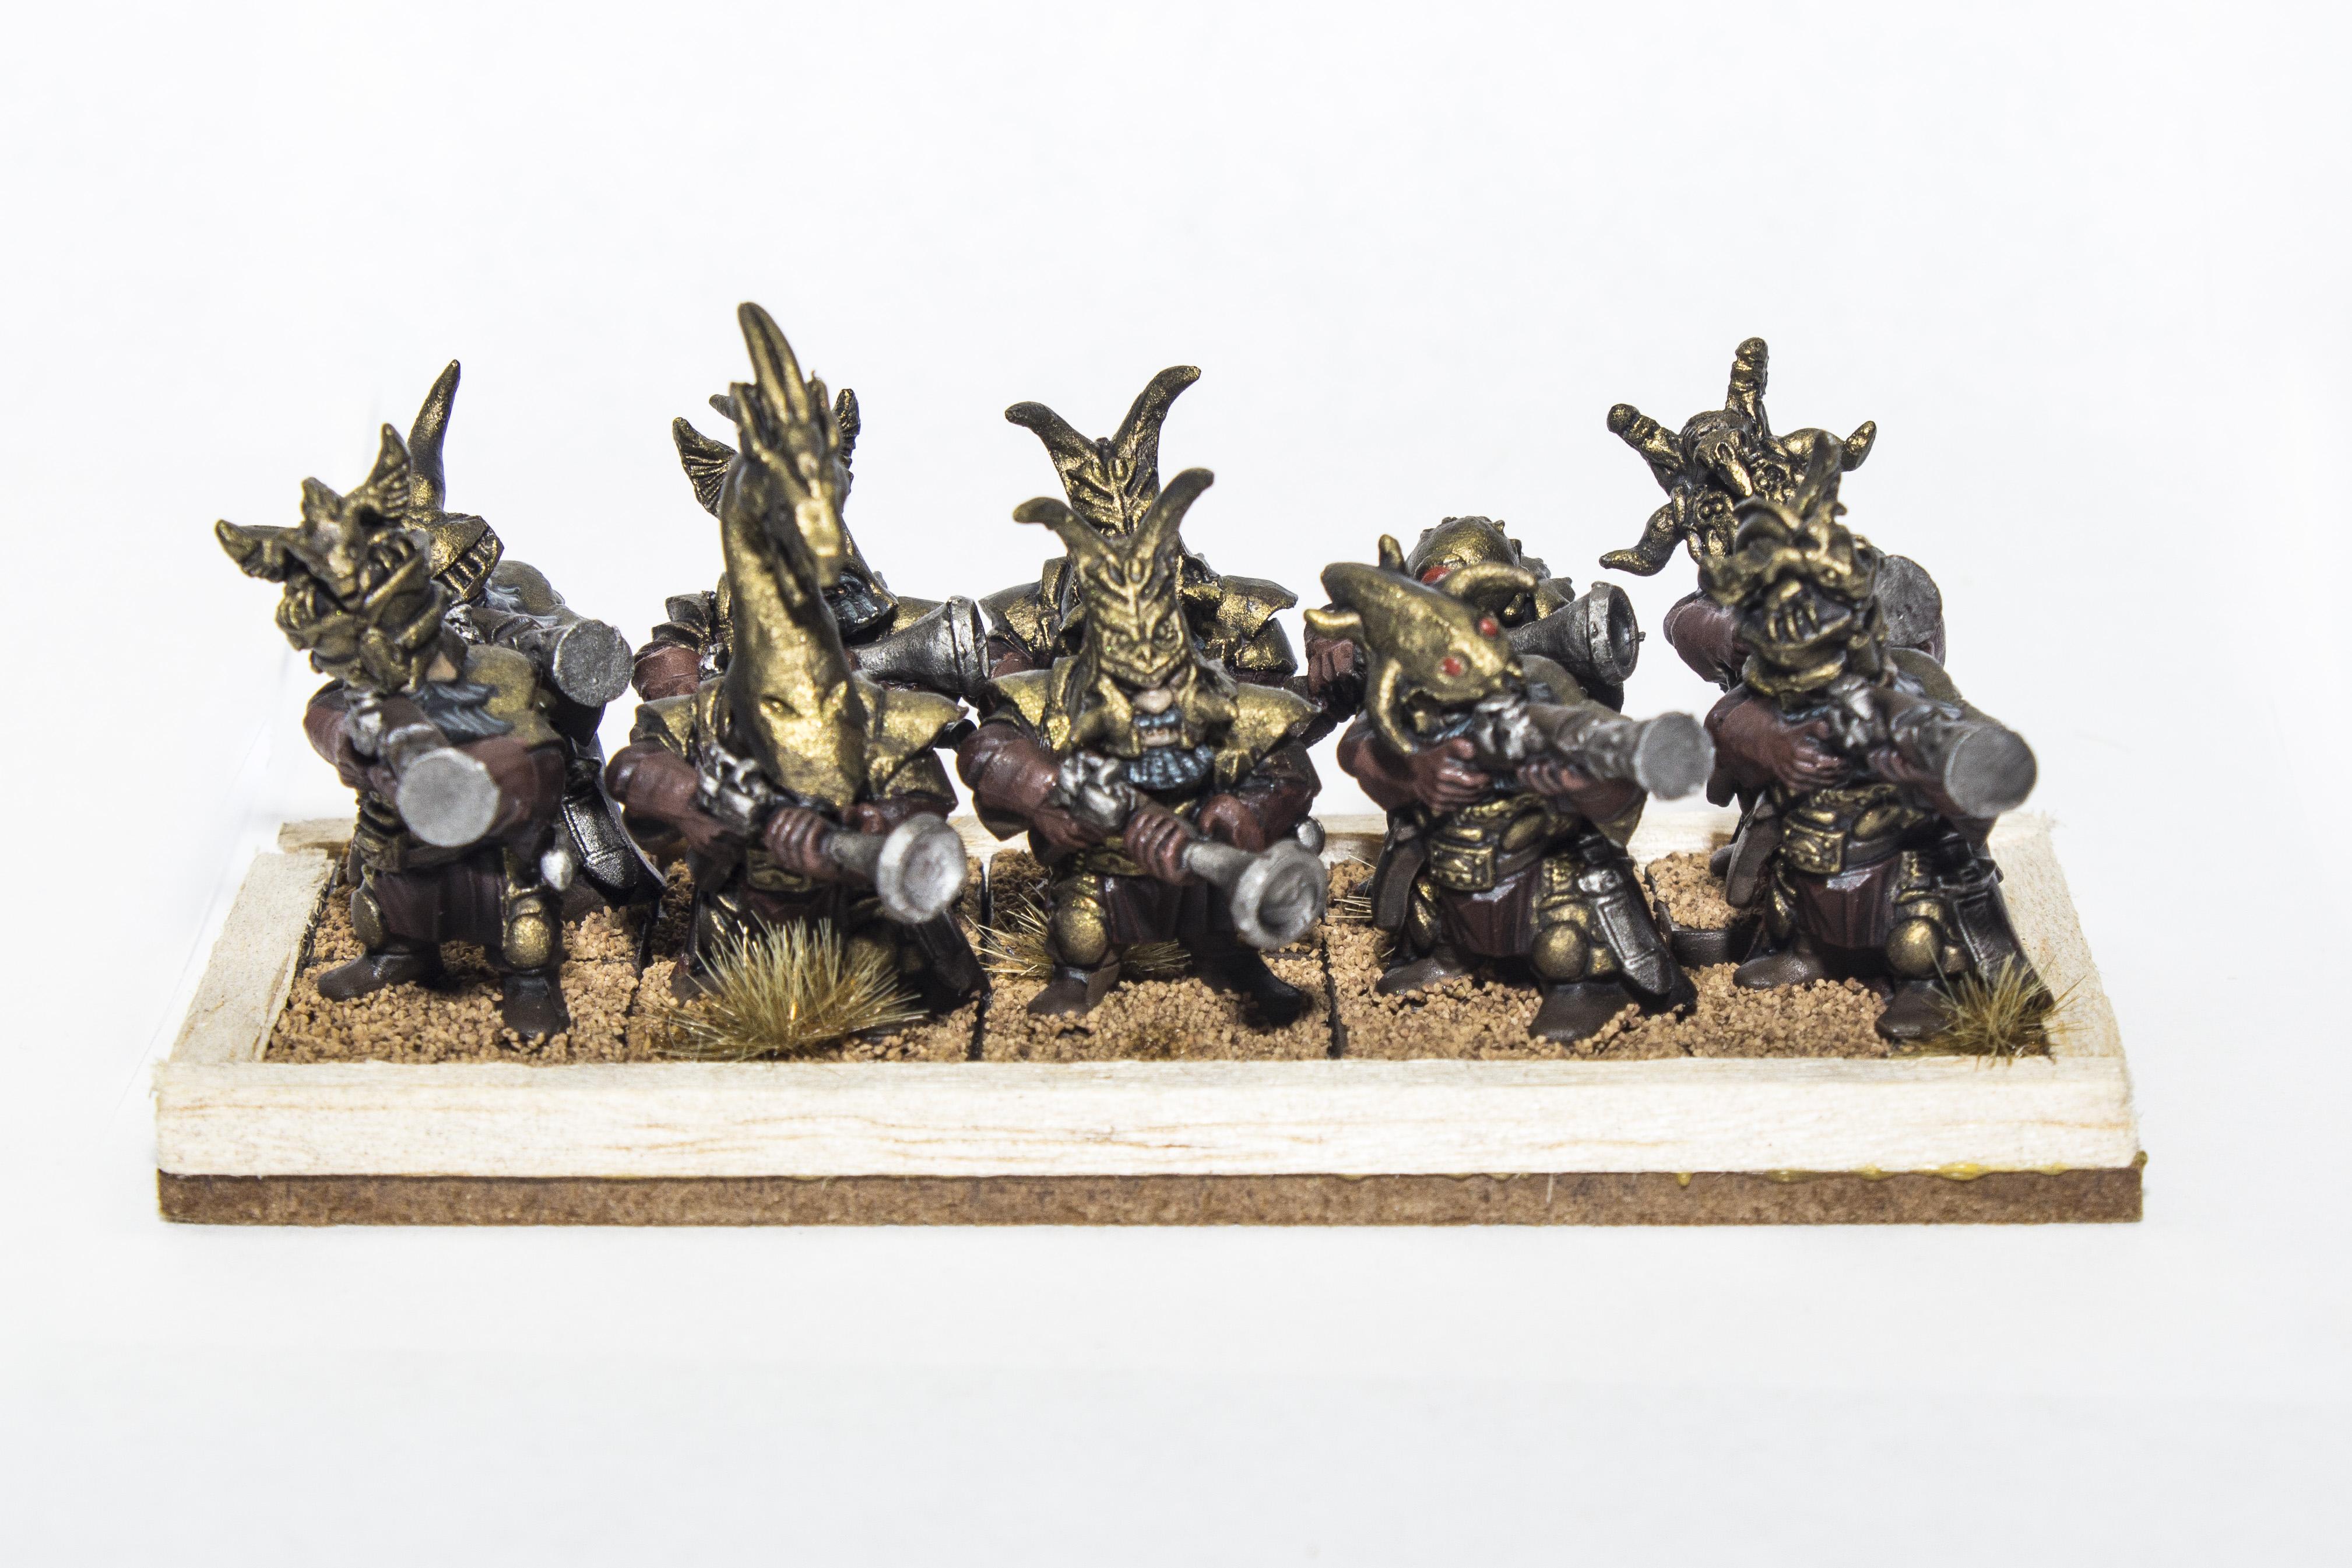 Abyssal_Dwarves_Decimators_2